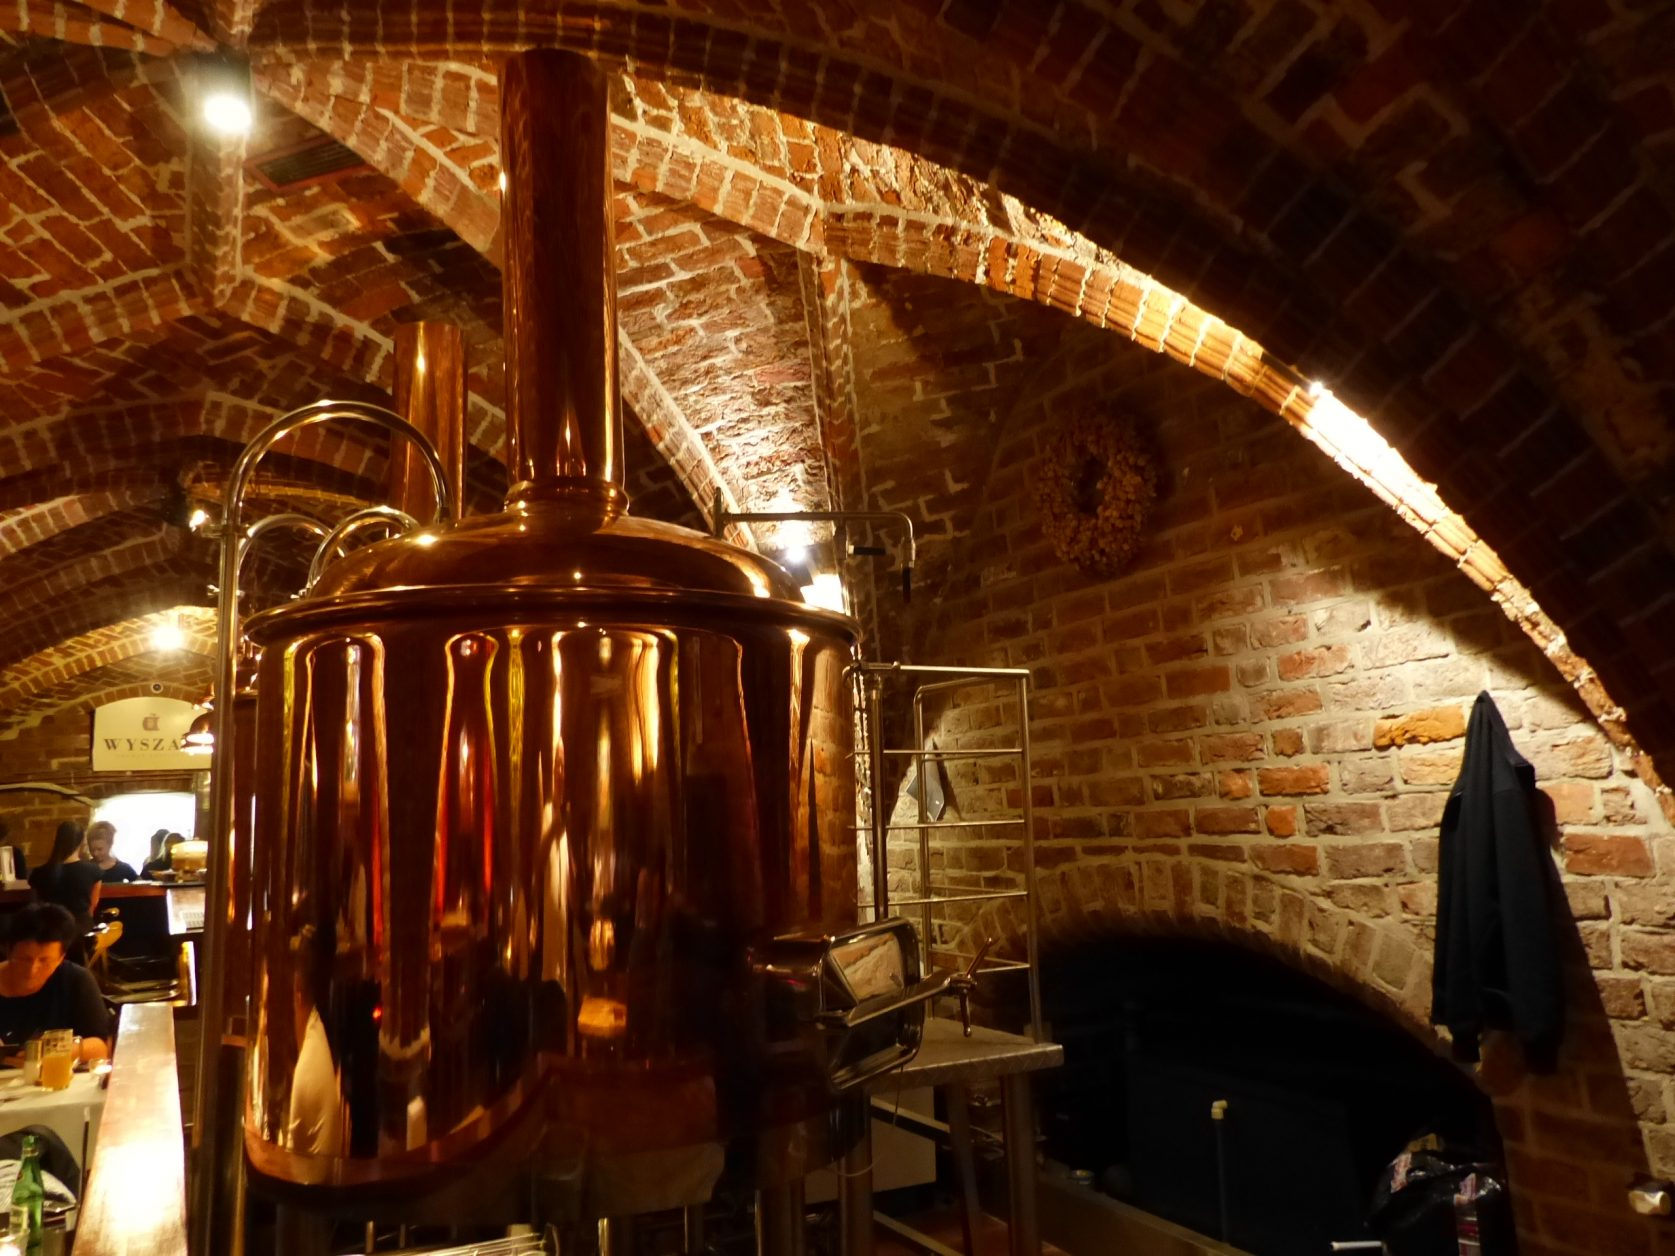 Brauerei im Rathauskeller Stettin